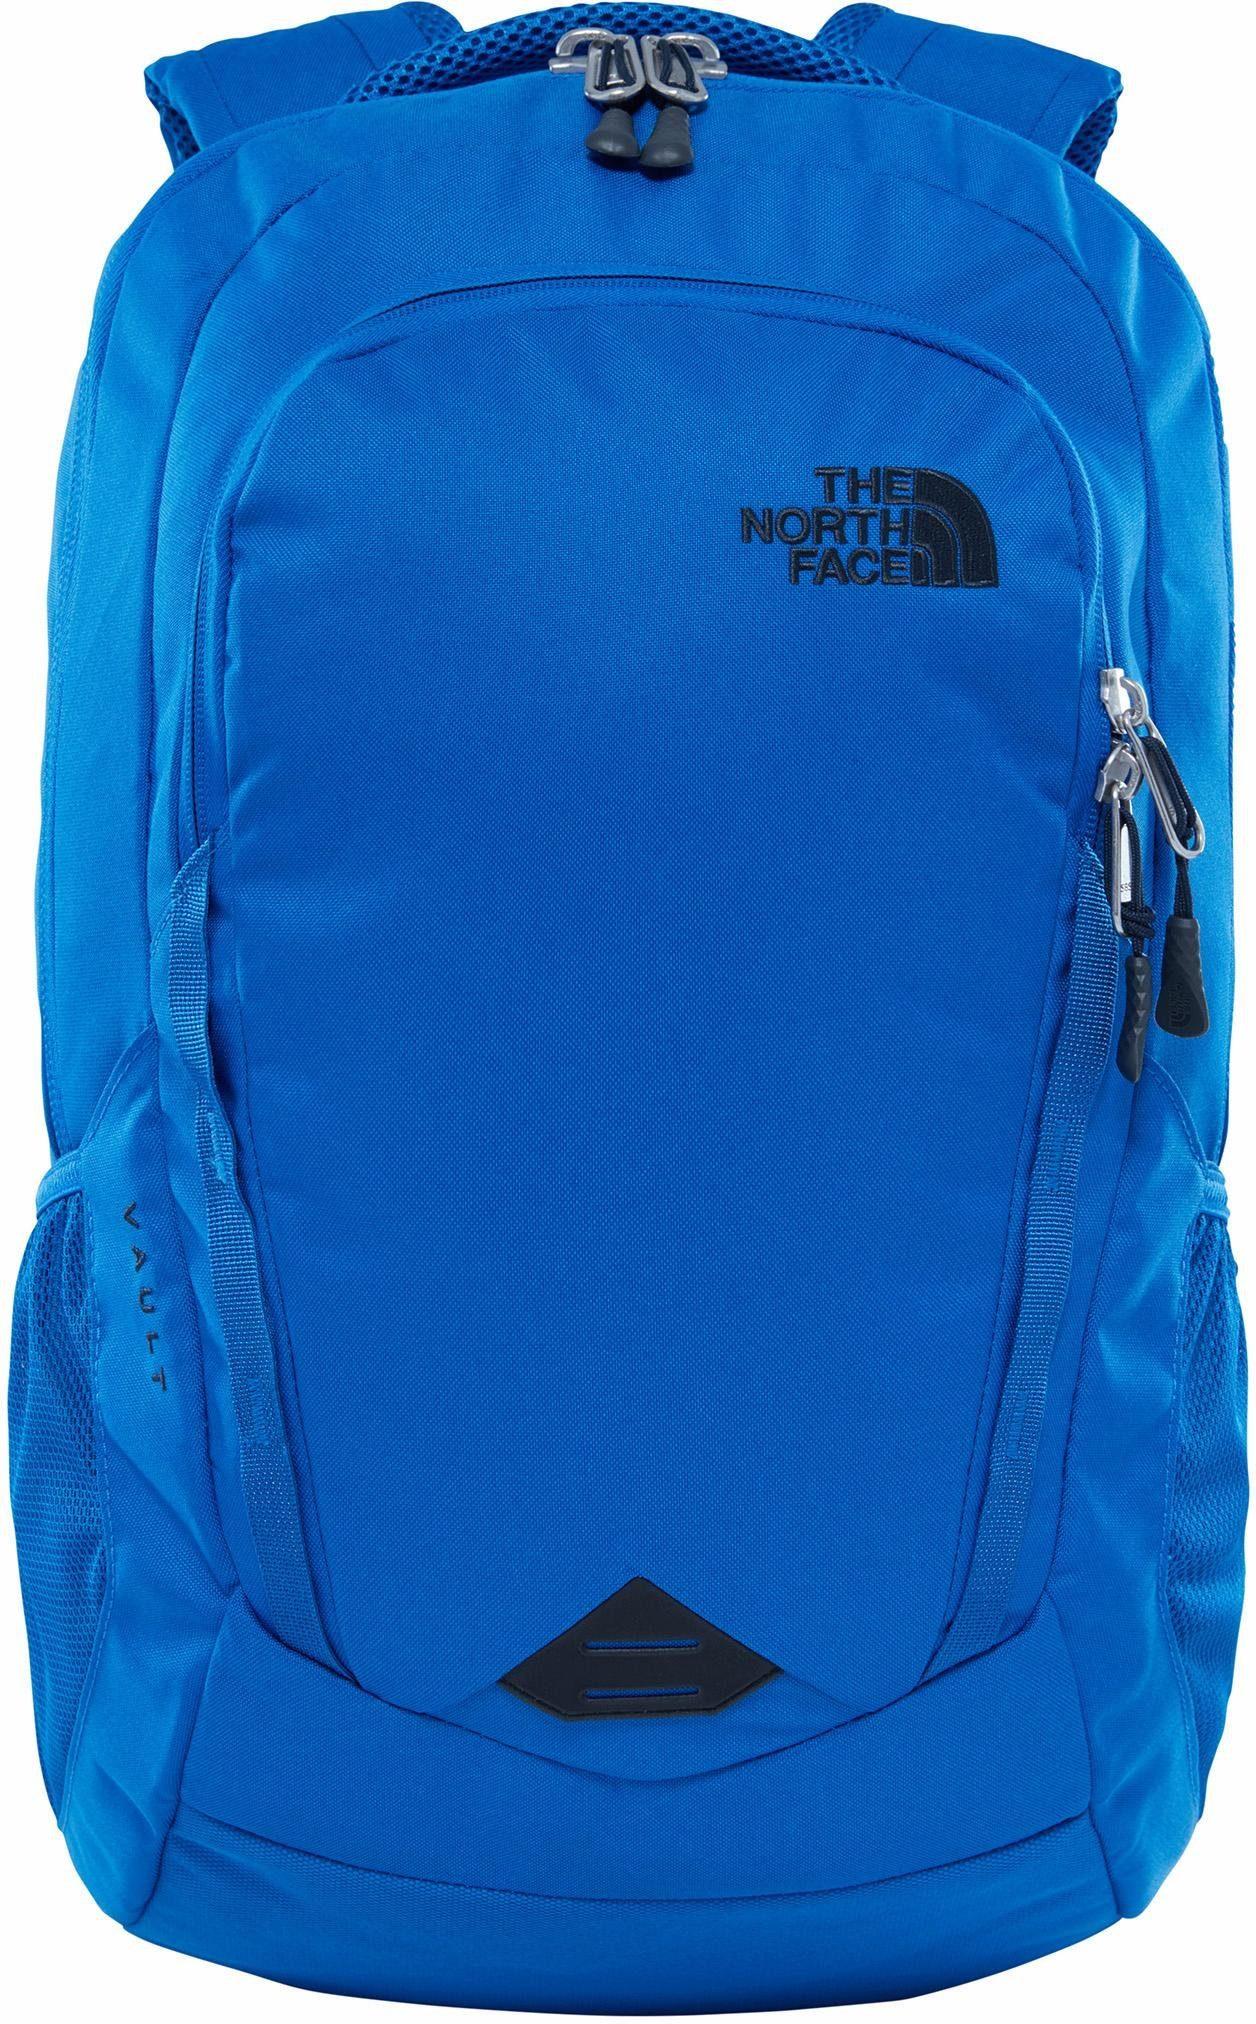 The North Face Rucksack mit 15-Zoll Laptopfach, »Vault, Blue/Navy«